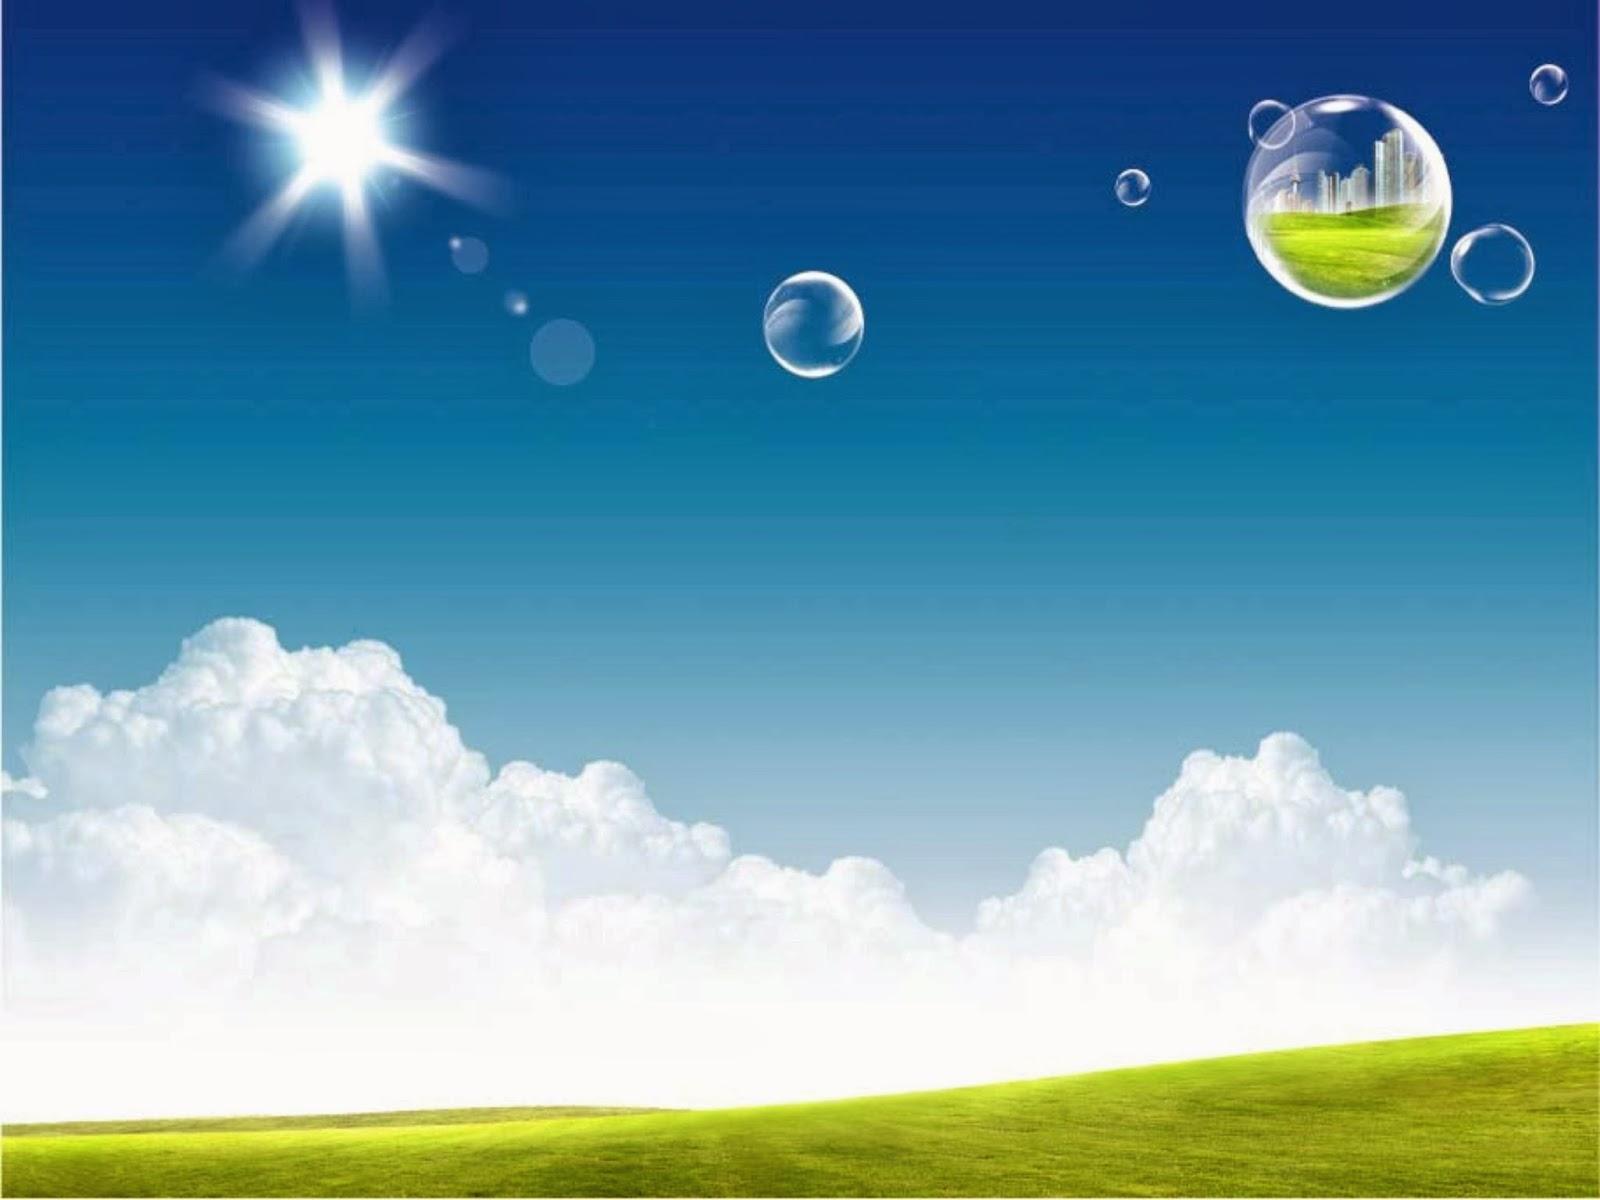 Nature Powerpoint Background 002 ~ แจก Powerpoint Template สวยๆ